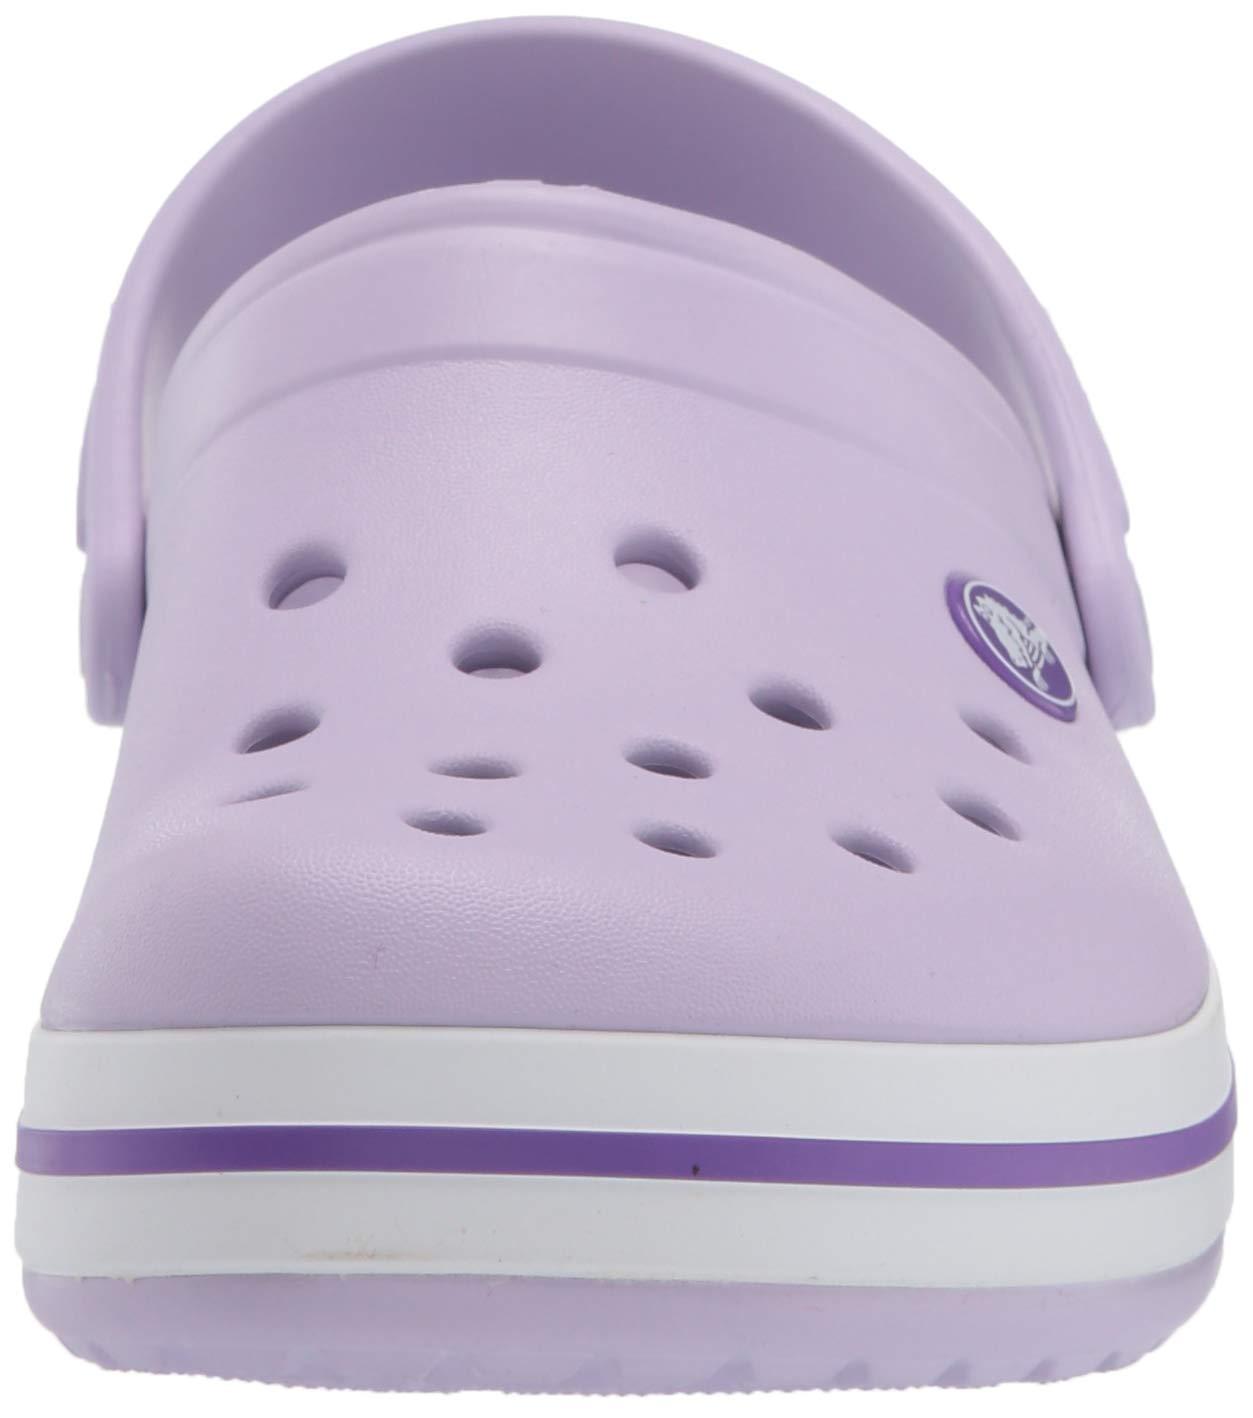 Crocs Kids' Crocband Clog, Lavender/Neon Purple, 10 M US Toddler by Crocs (Image #4)